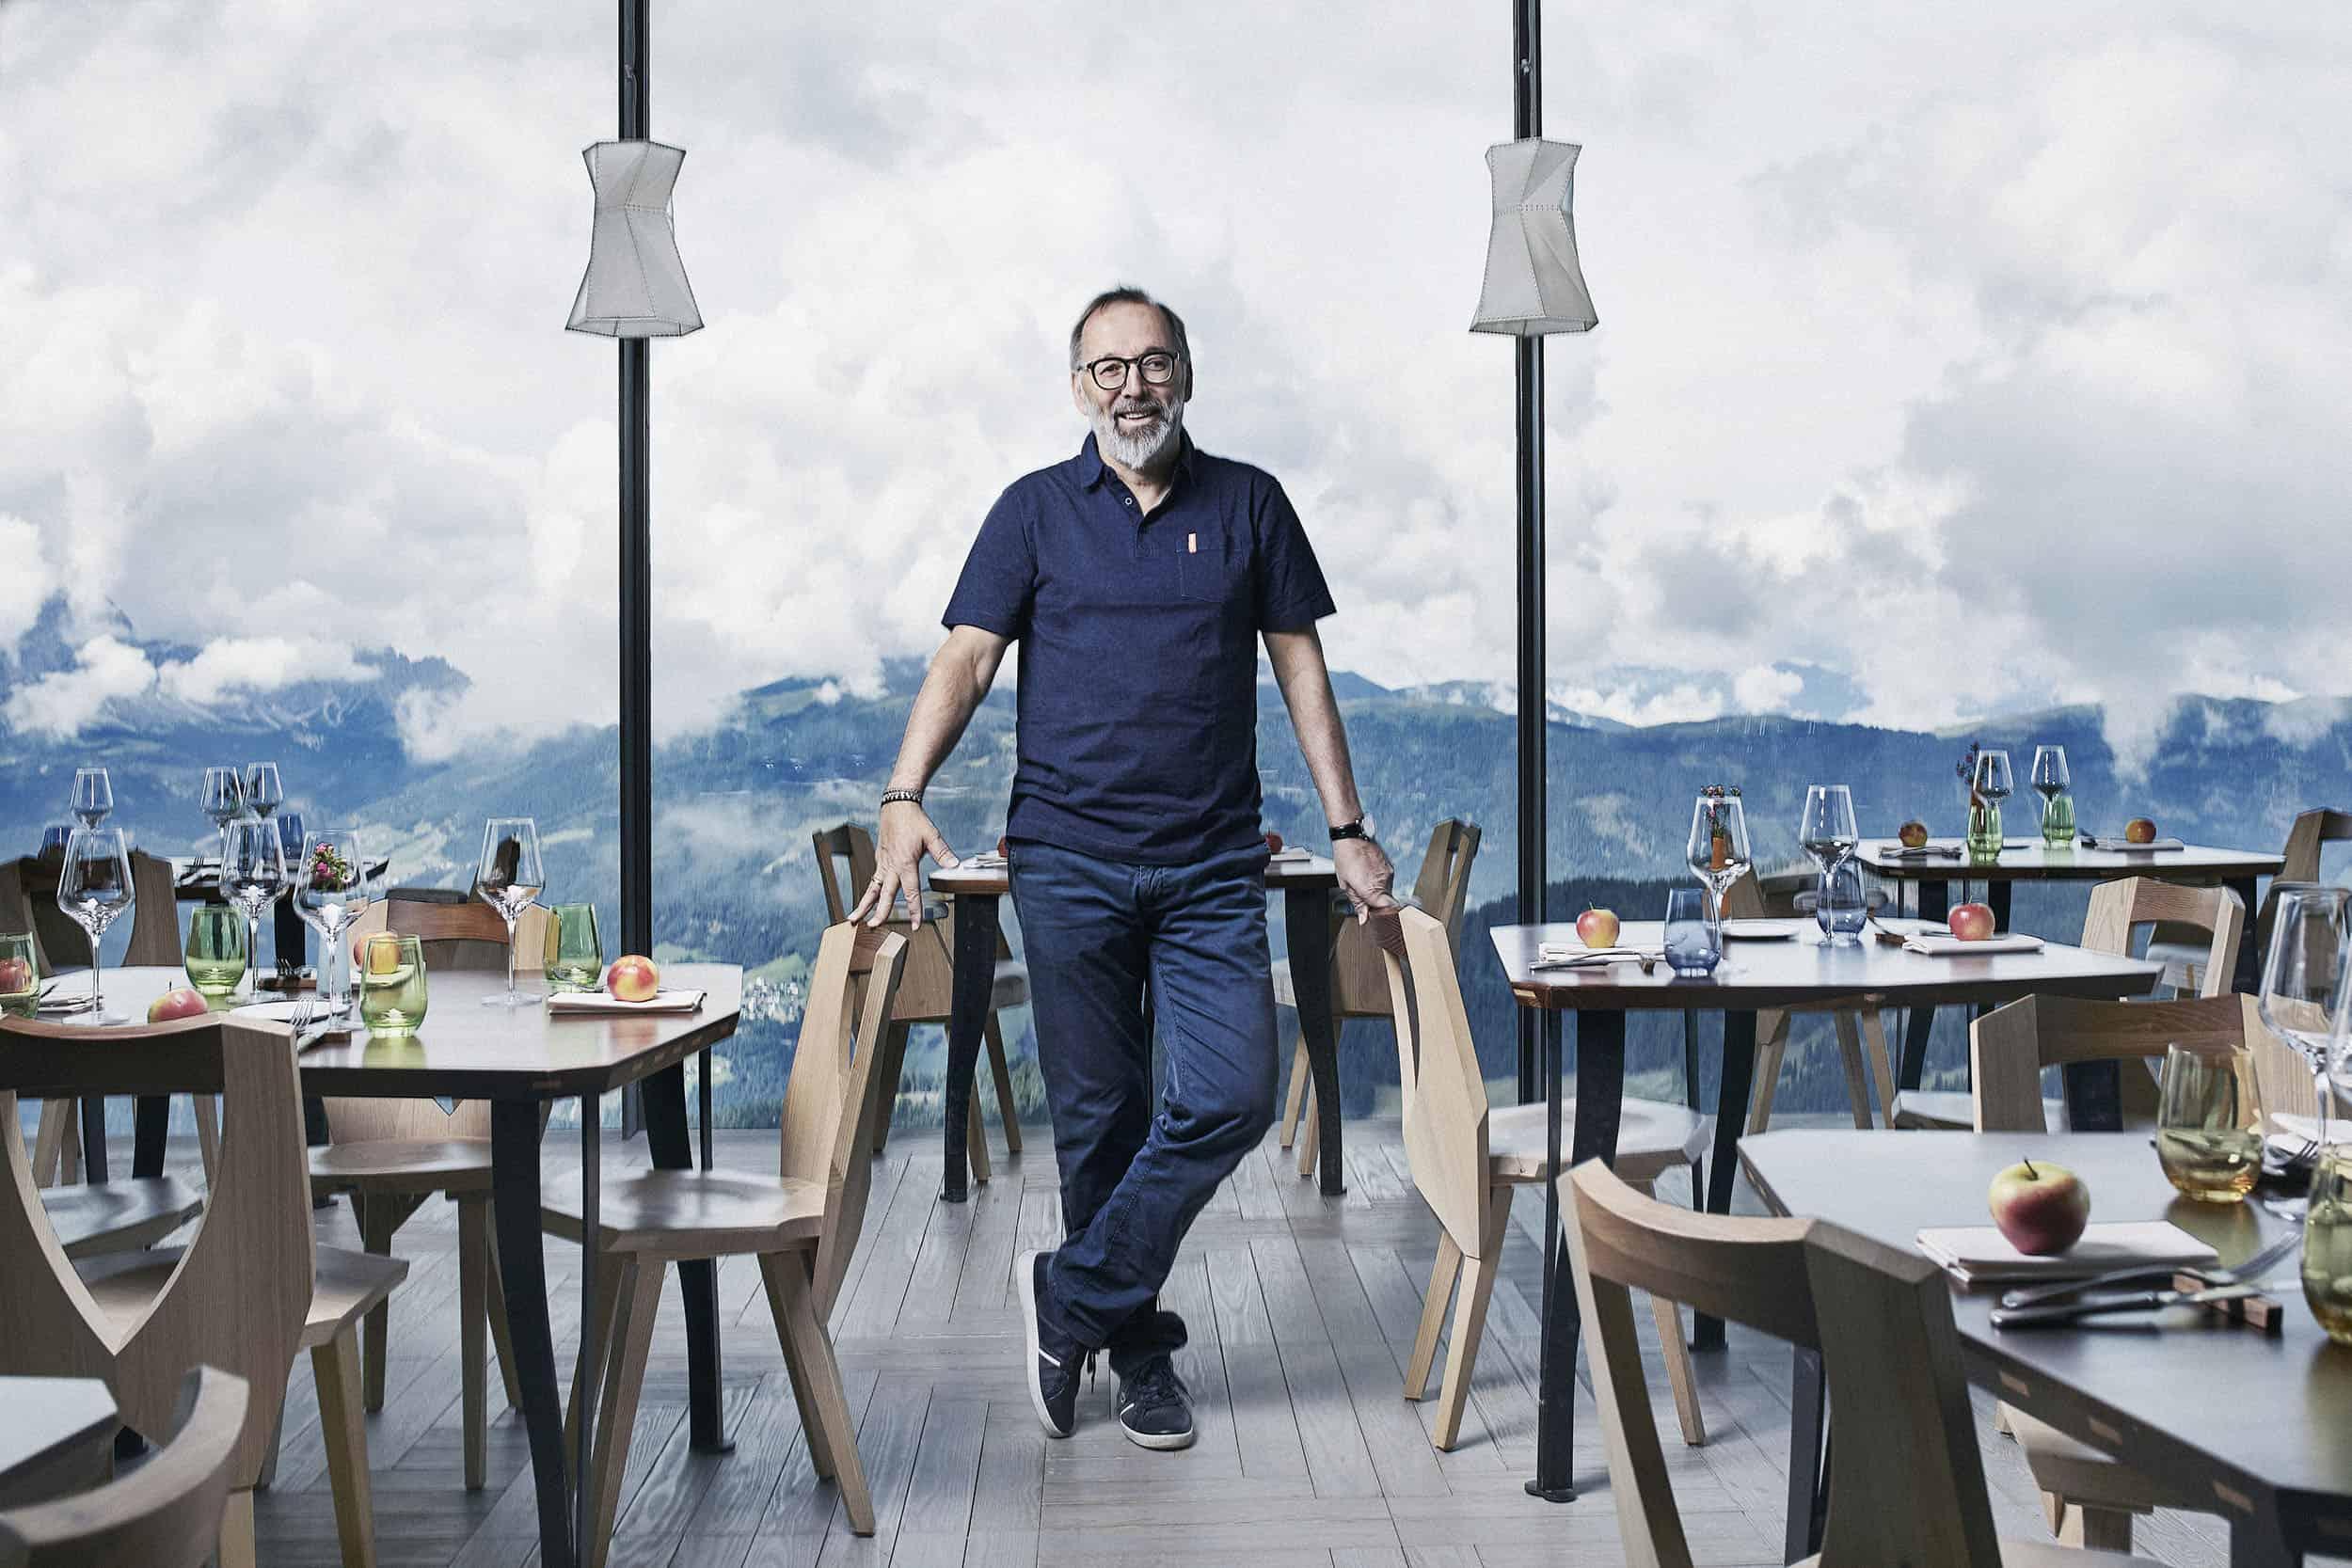 studio-ignatov-norbert-niederkofler-alpinn-imagekampagne-05